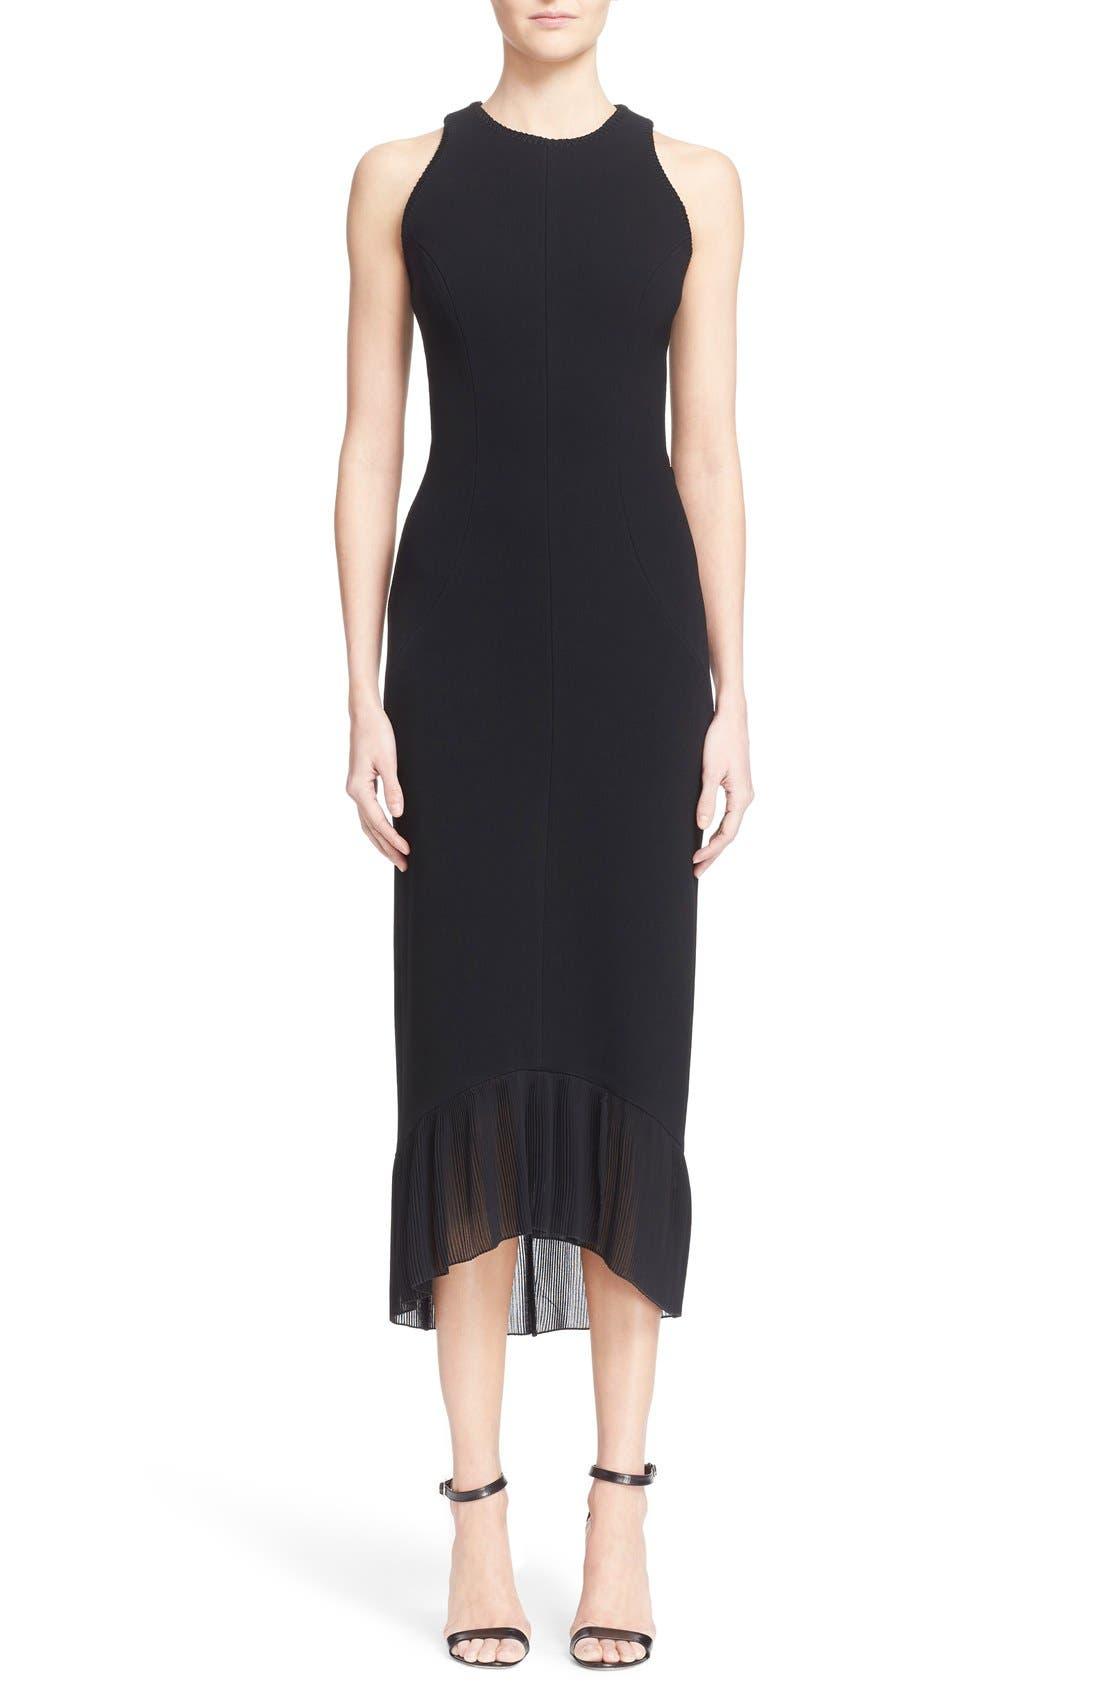 Alternate Image 1 Selected - Victoria Beckham Crepe Sheath Dress